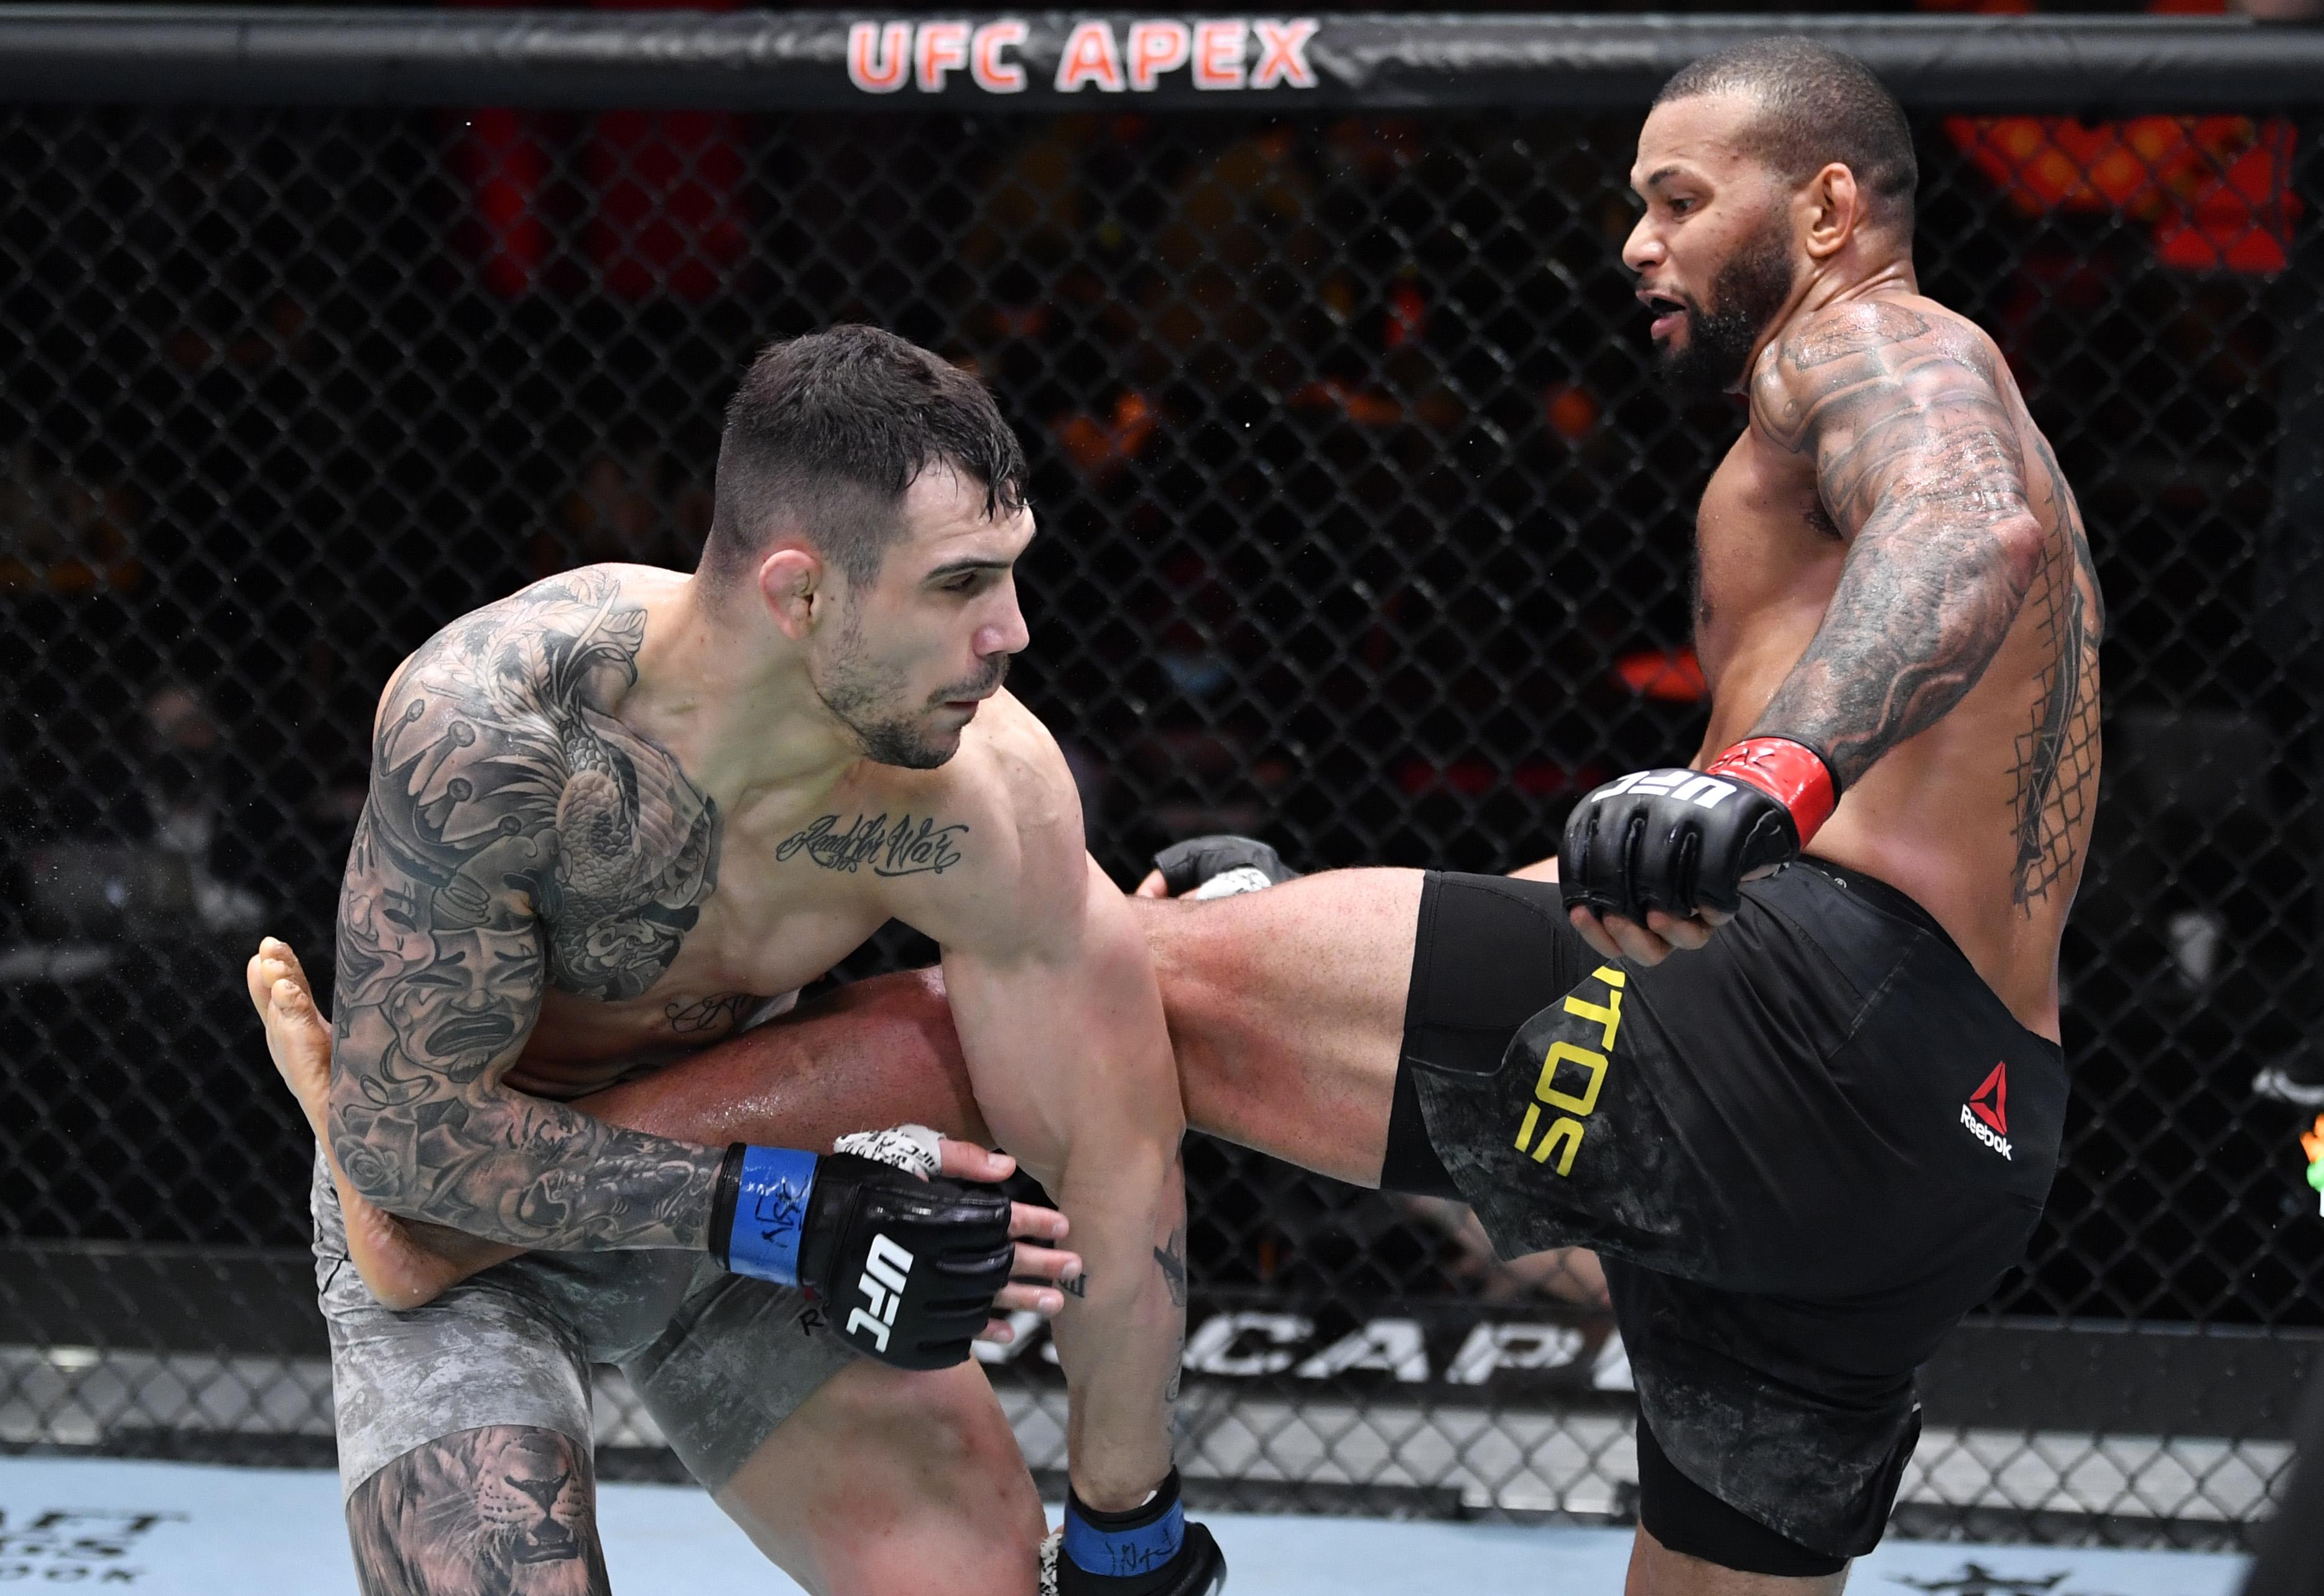 Thiago Santos of Brazil kicks Aleksandar Rakic of Austria in their light heavyweight fight during the UFC 259 event at UFC APEX on March 06, 2021 in Las Vegas, Nevada